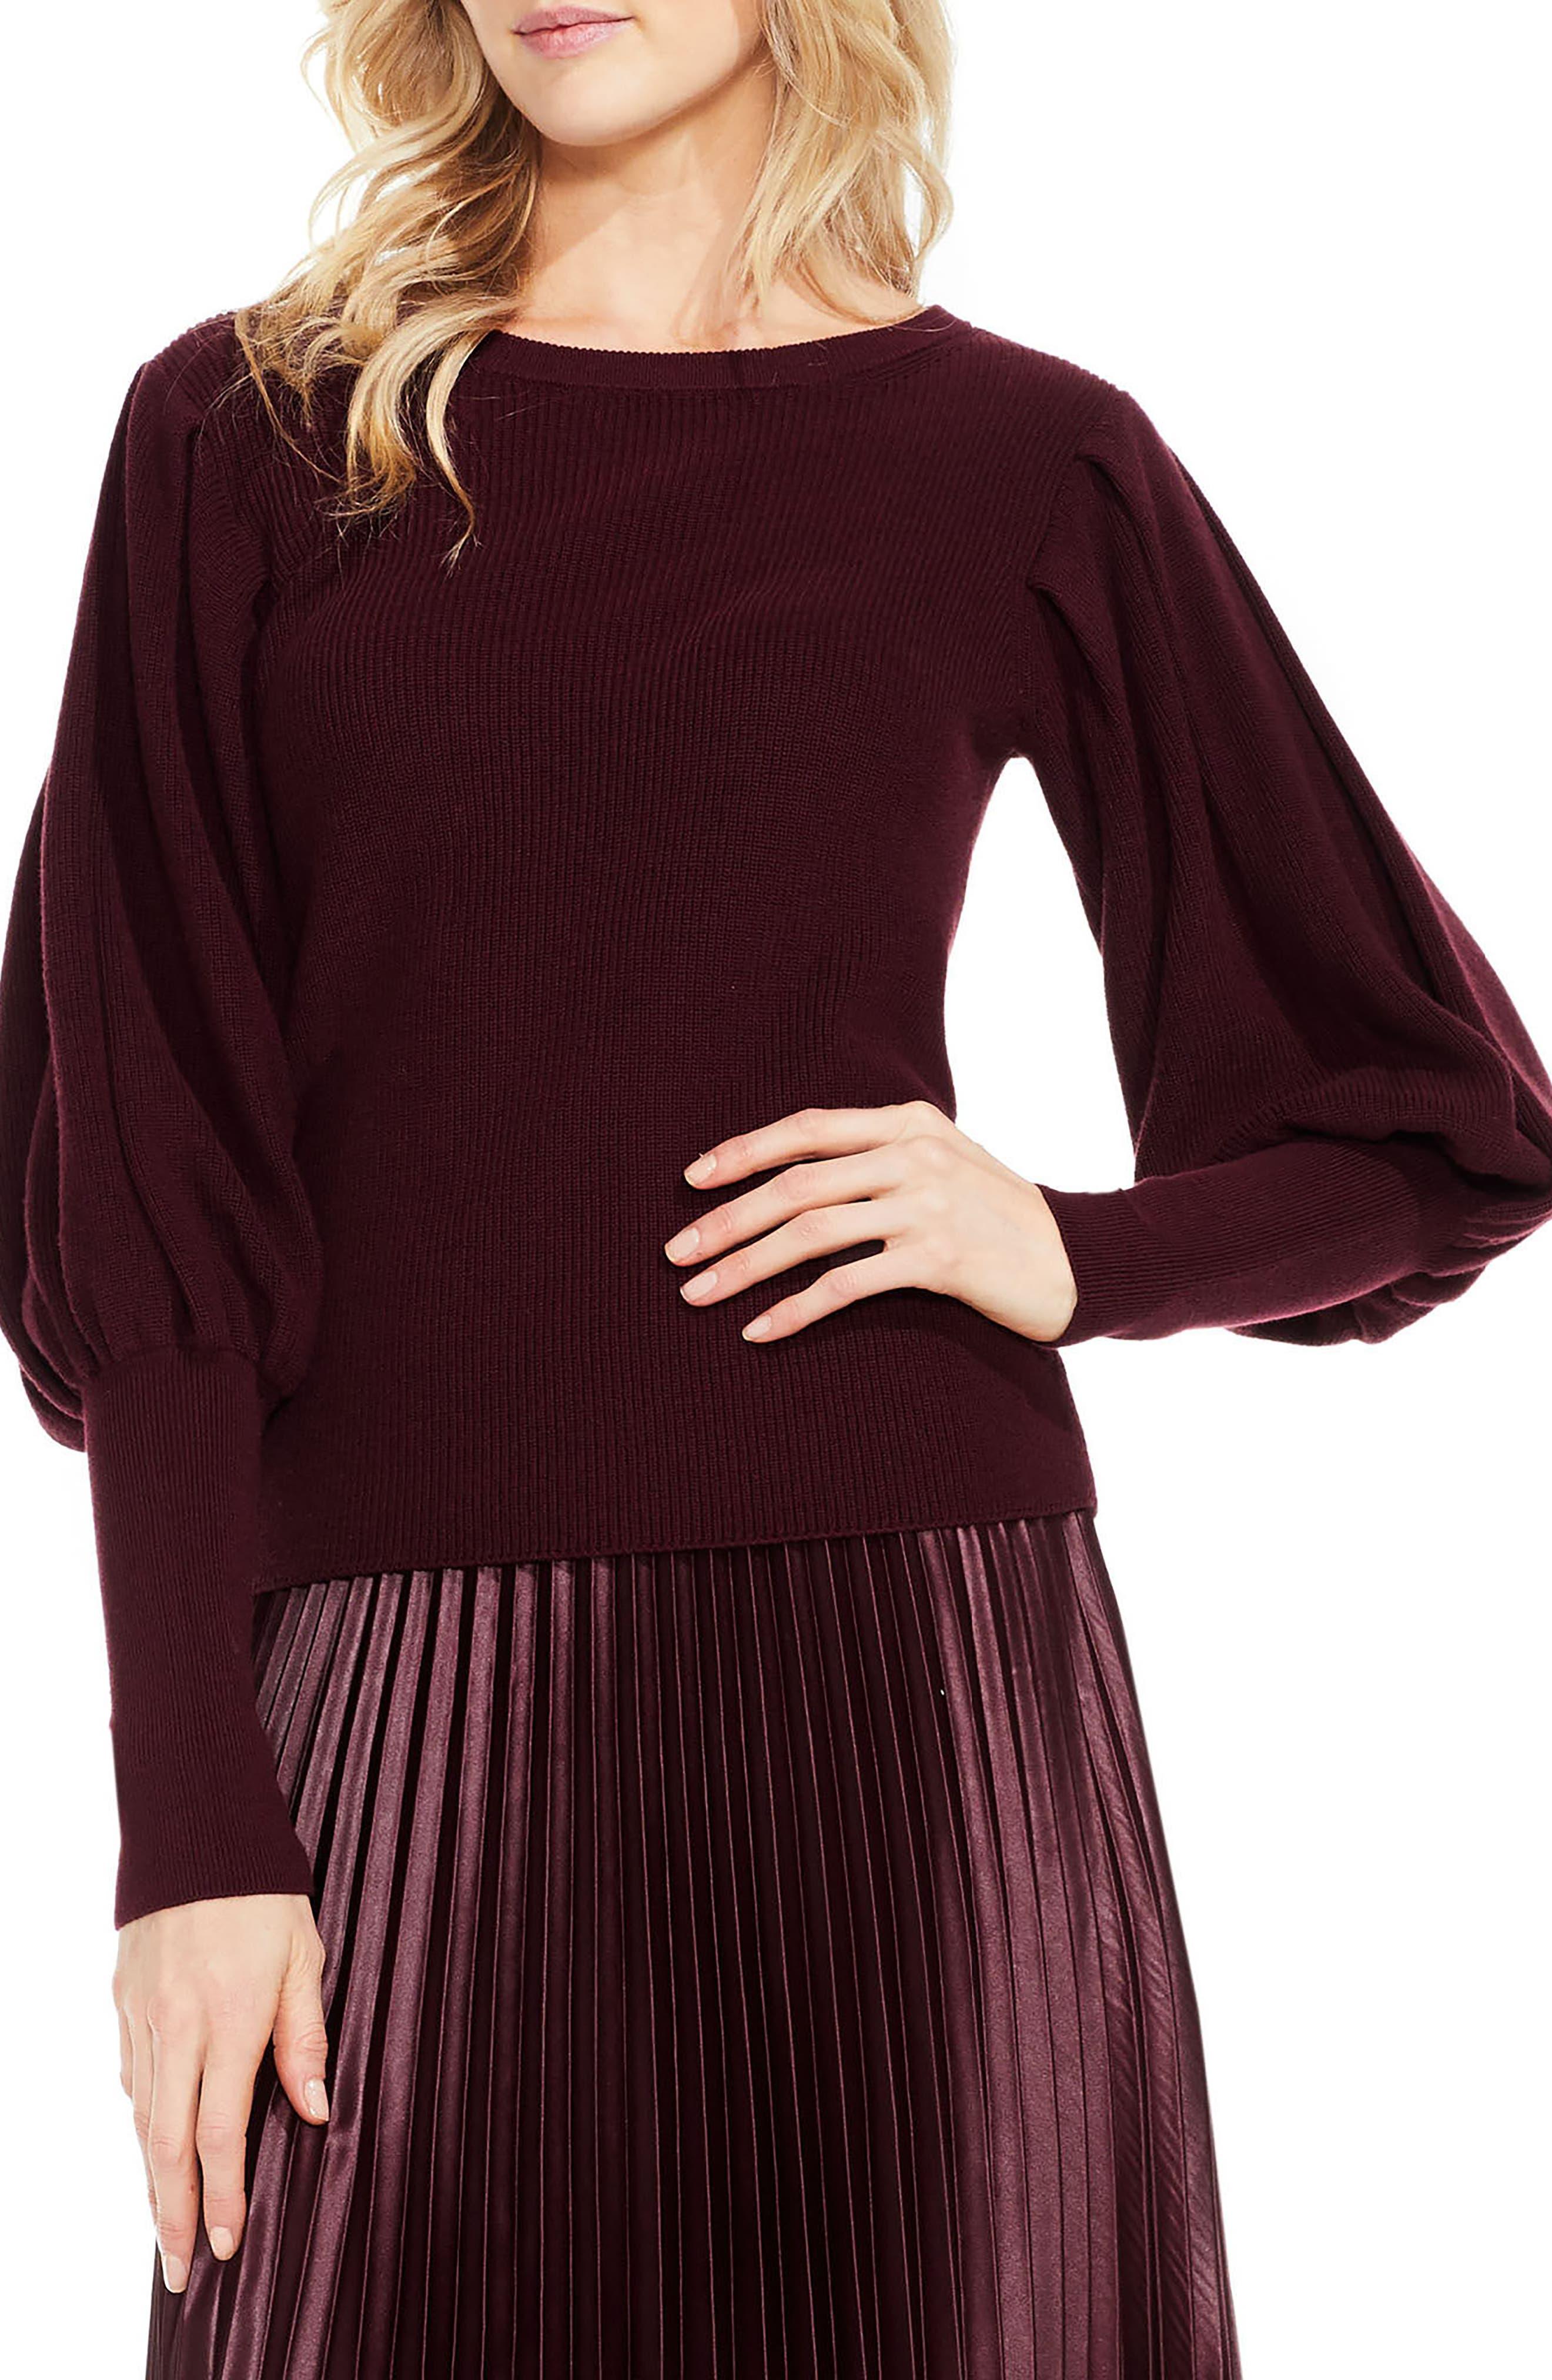 Bubble Sleeve Sweater,                         Main,                         color, Deep Claret